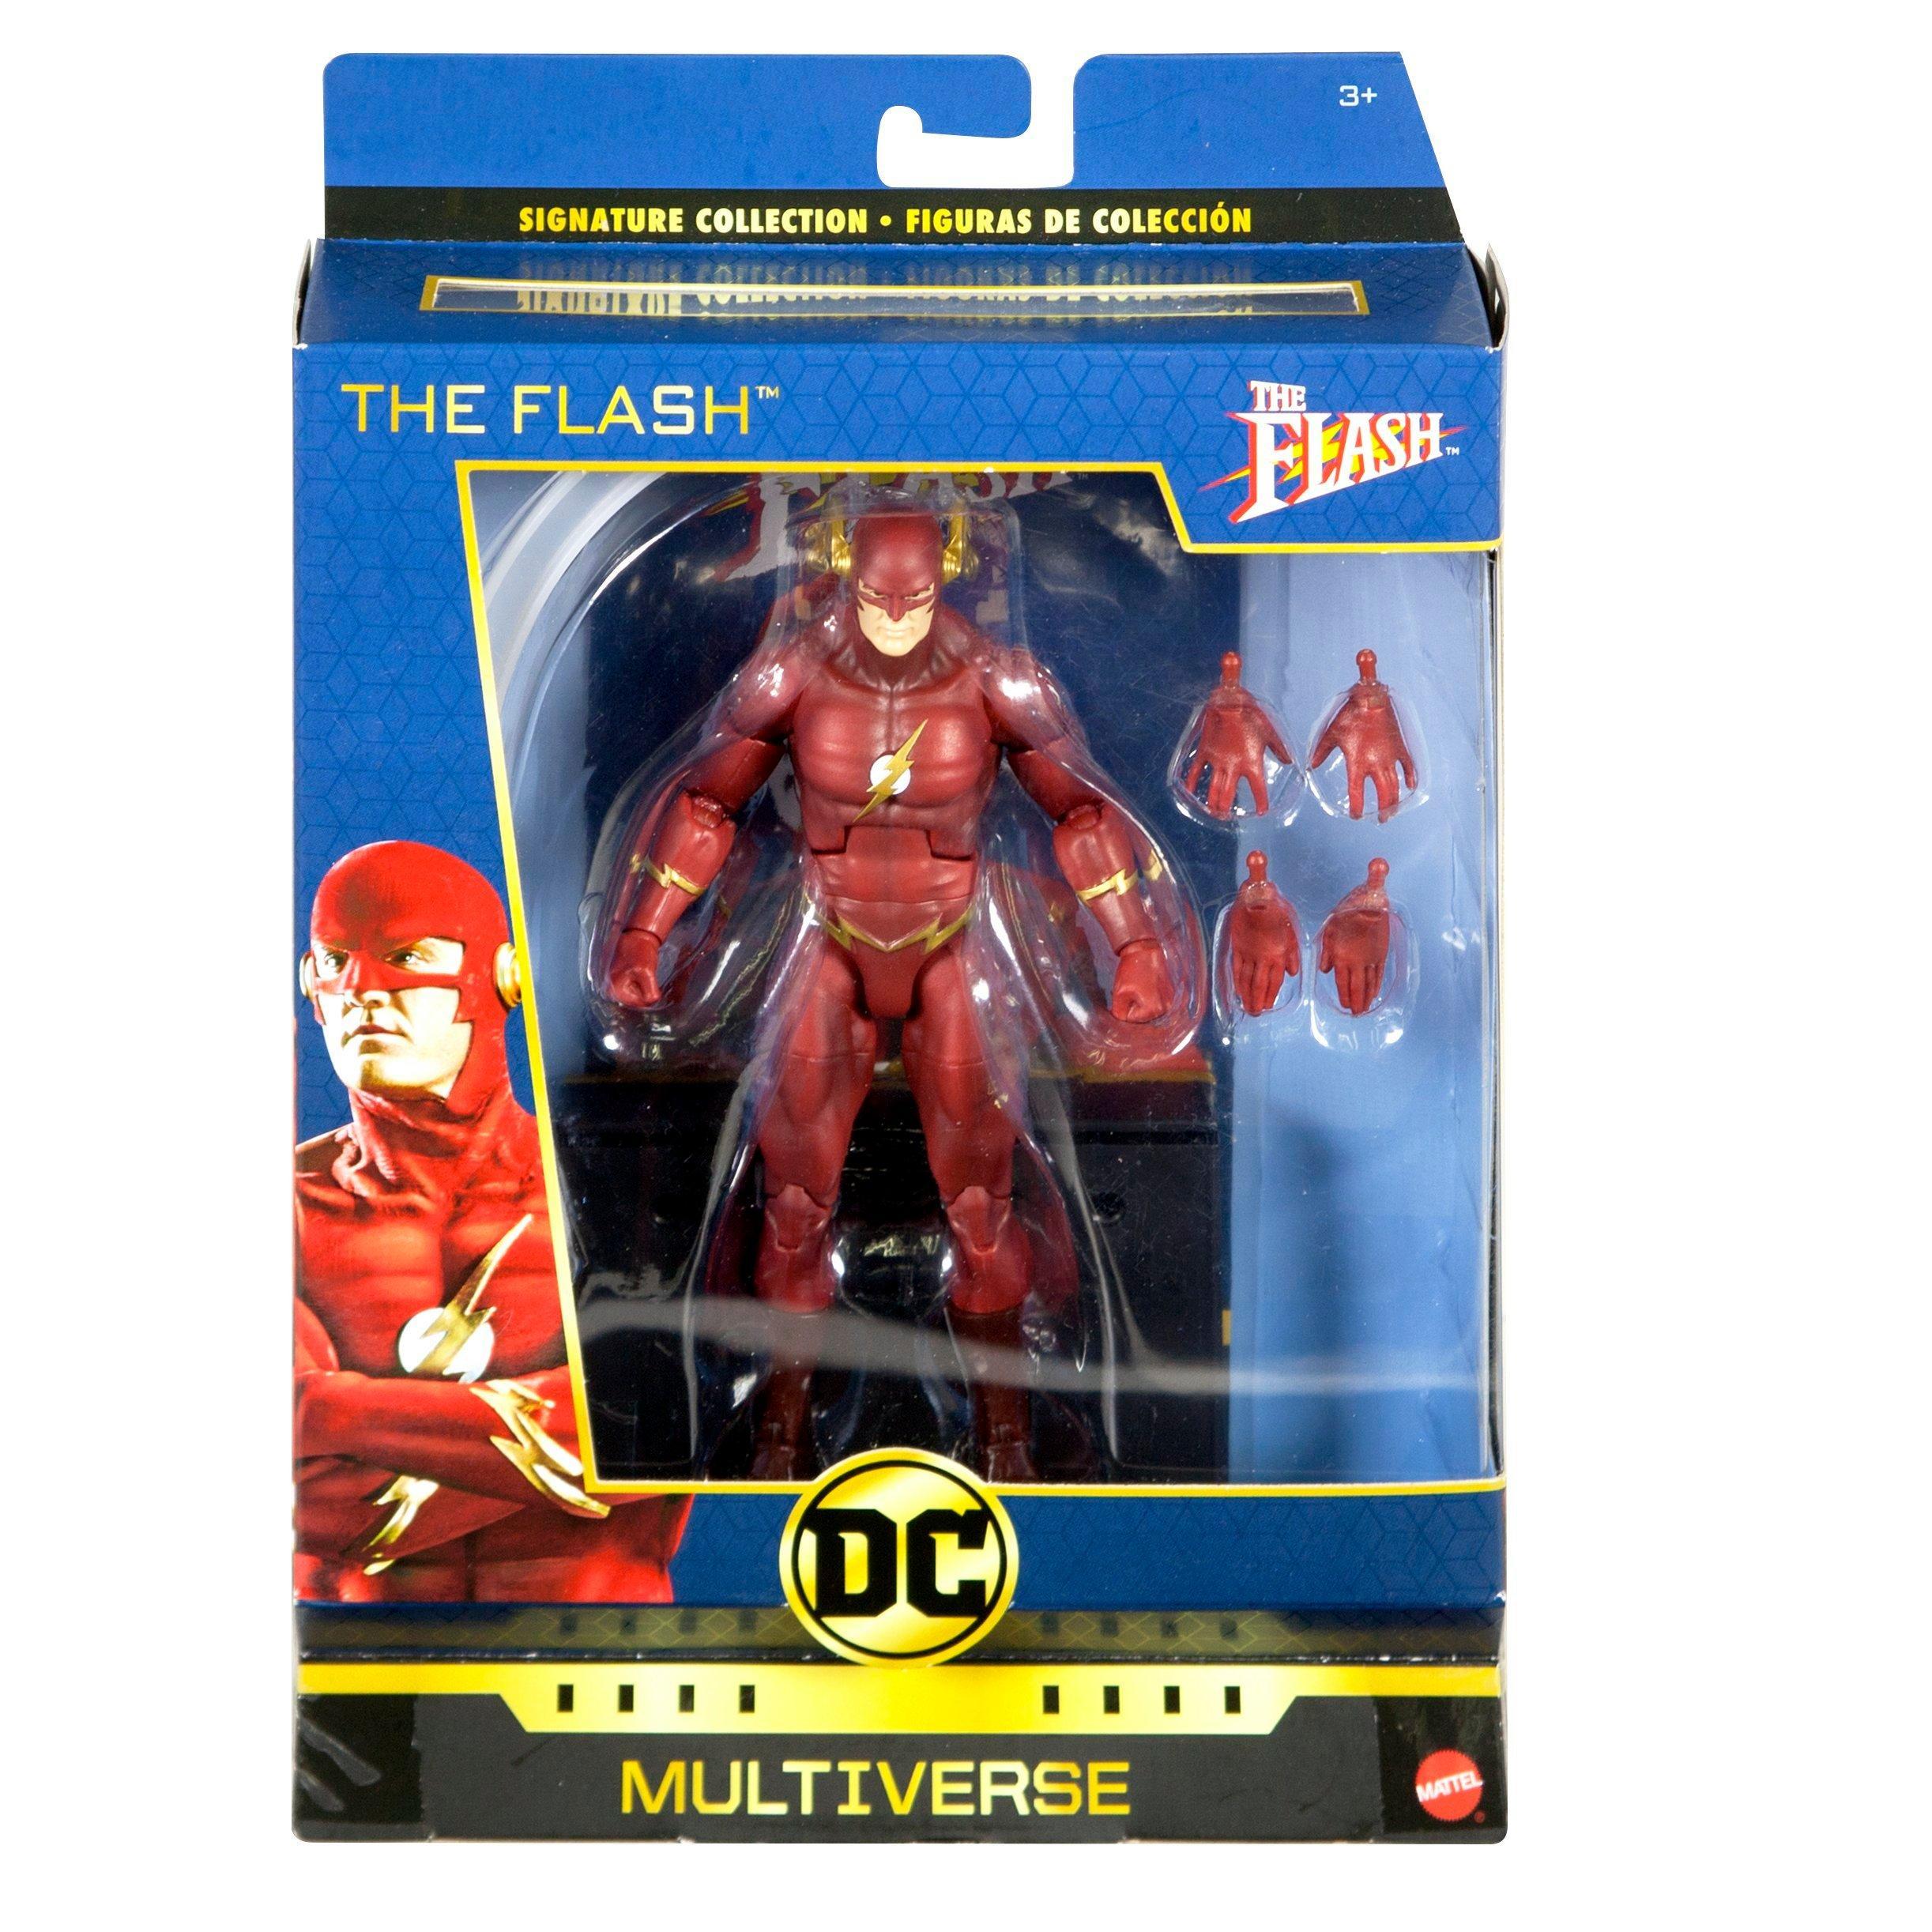 DC Comics The Flash Season 3 The Flash Action Figure